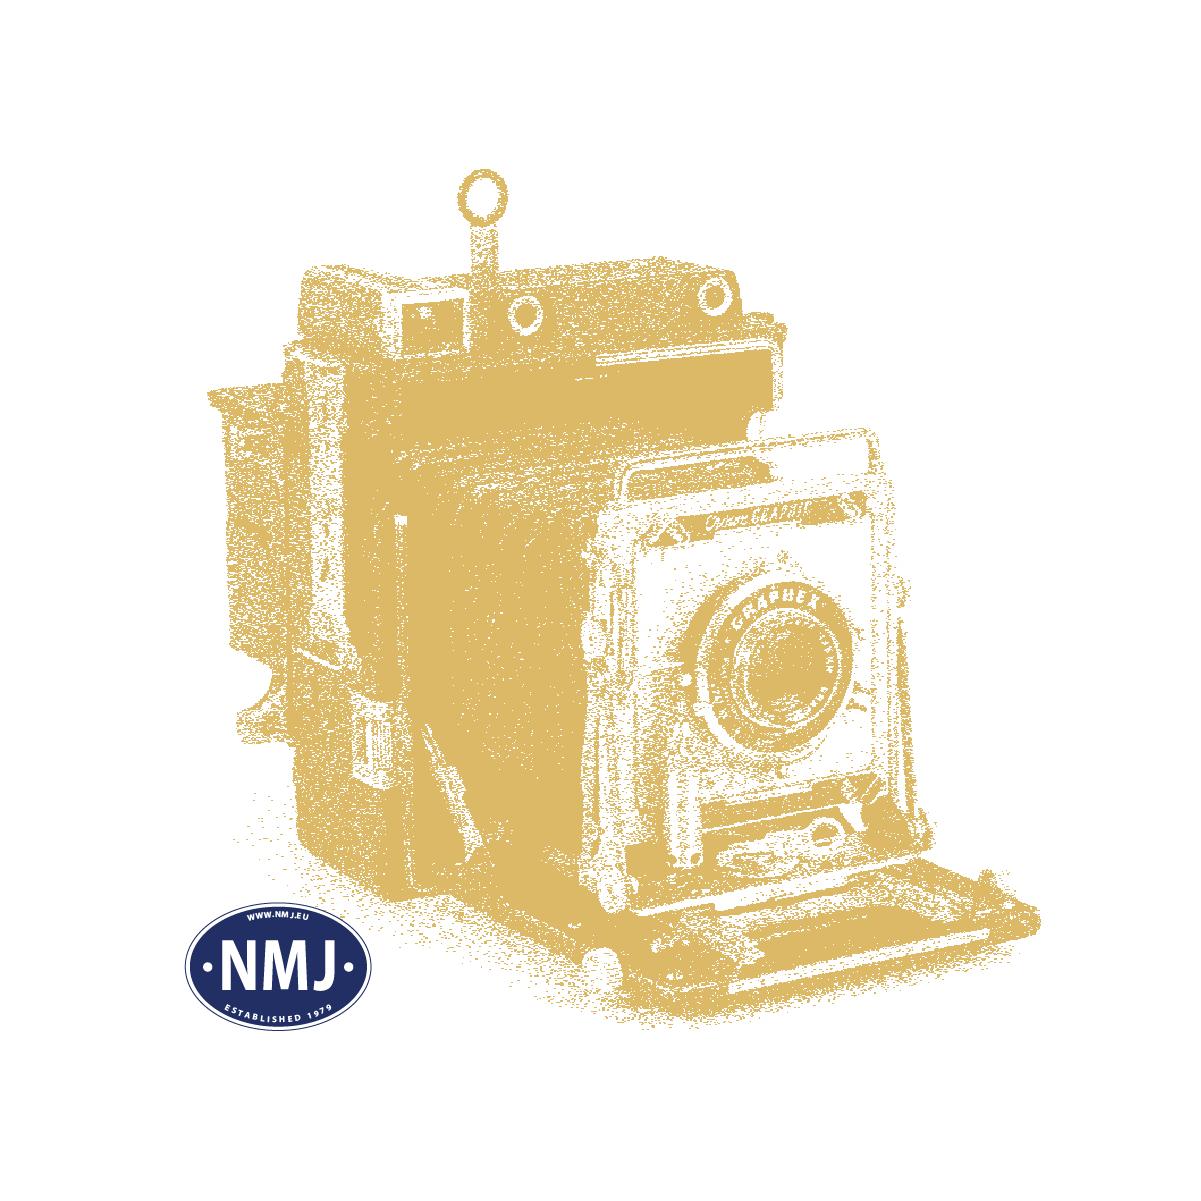 NMJT221.203 - NMJ Topline SJ Personvogn Bo8b 3597